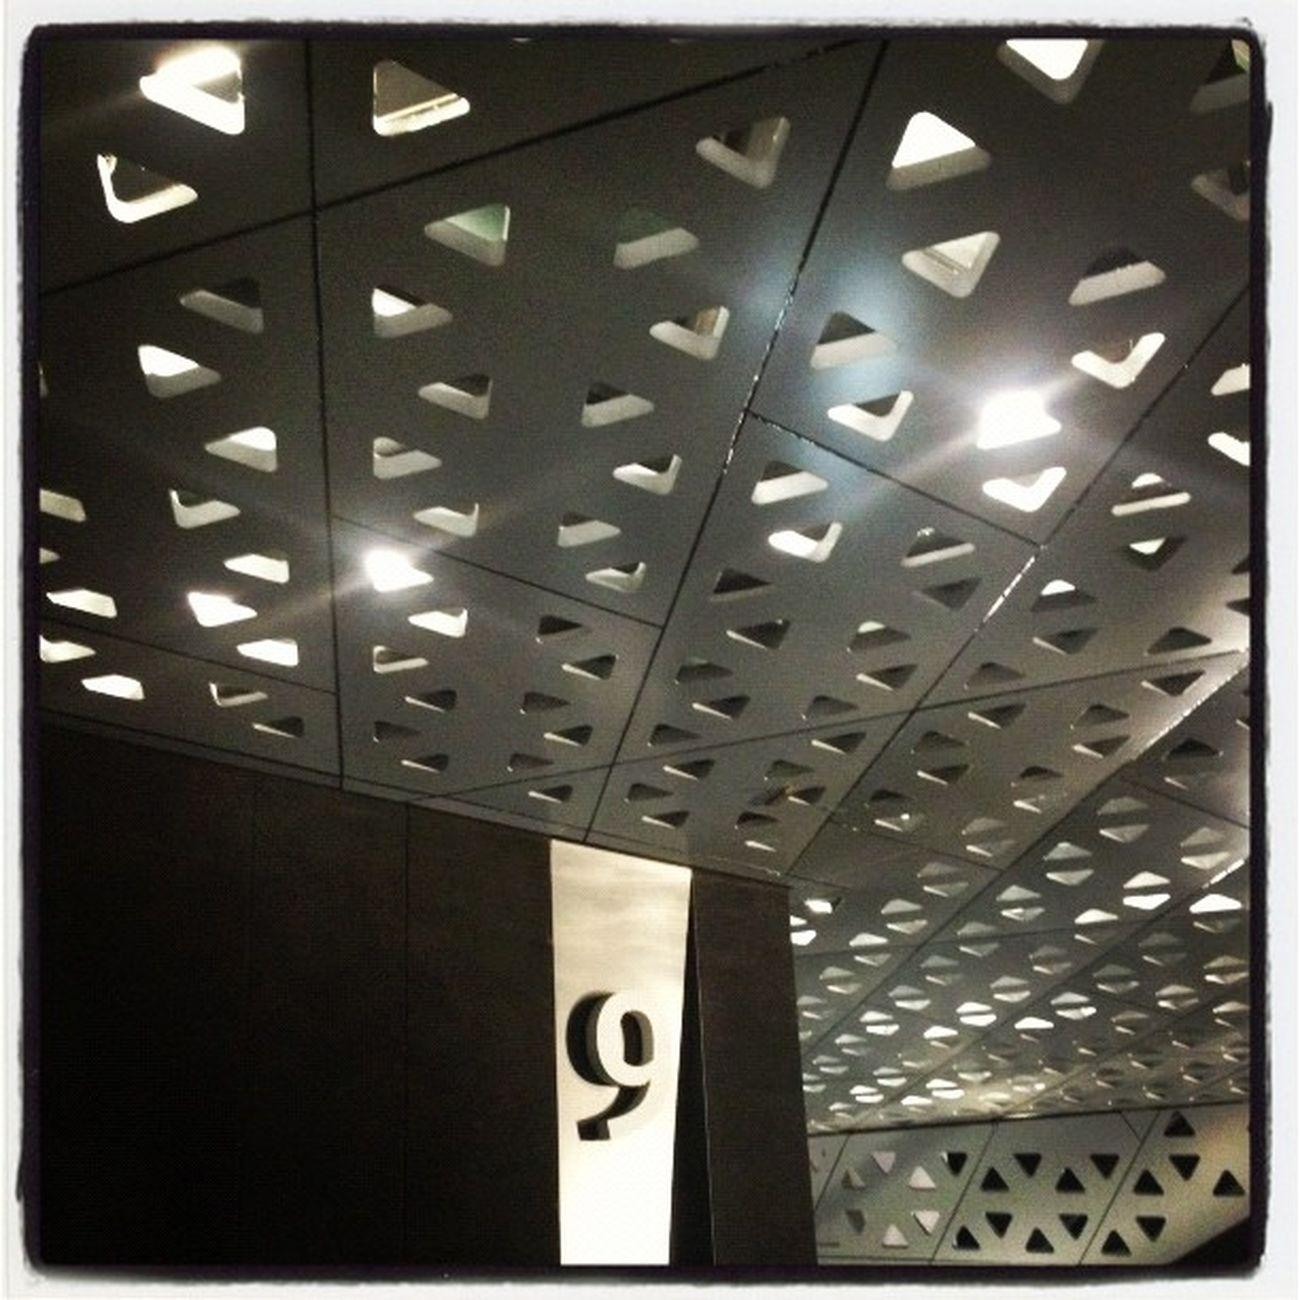 9 Squaready Igers Igersdf Proyectodf Nueve 9 Mextagram Mexingers Cineteca Nacional Reapertura Travel Taveler Architecture Arquitectura